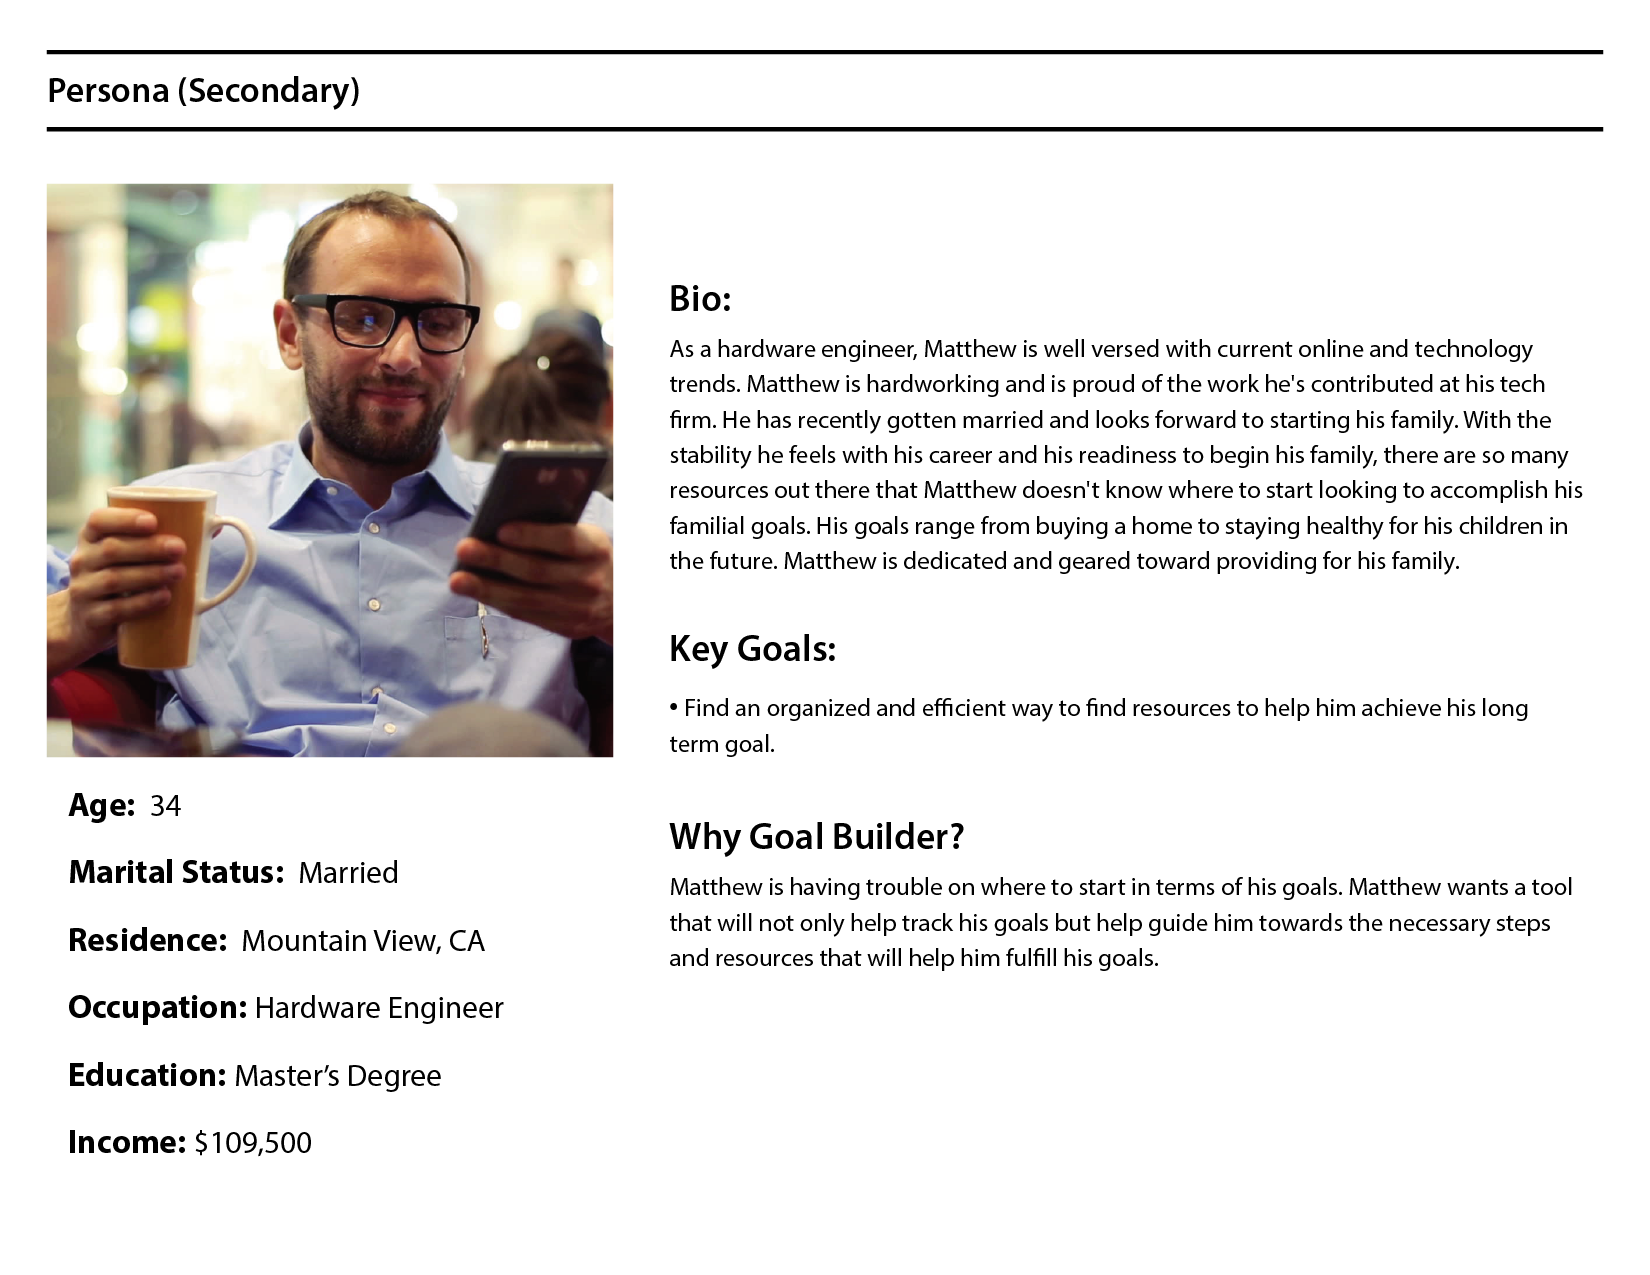 goal-builder-personas-02.png